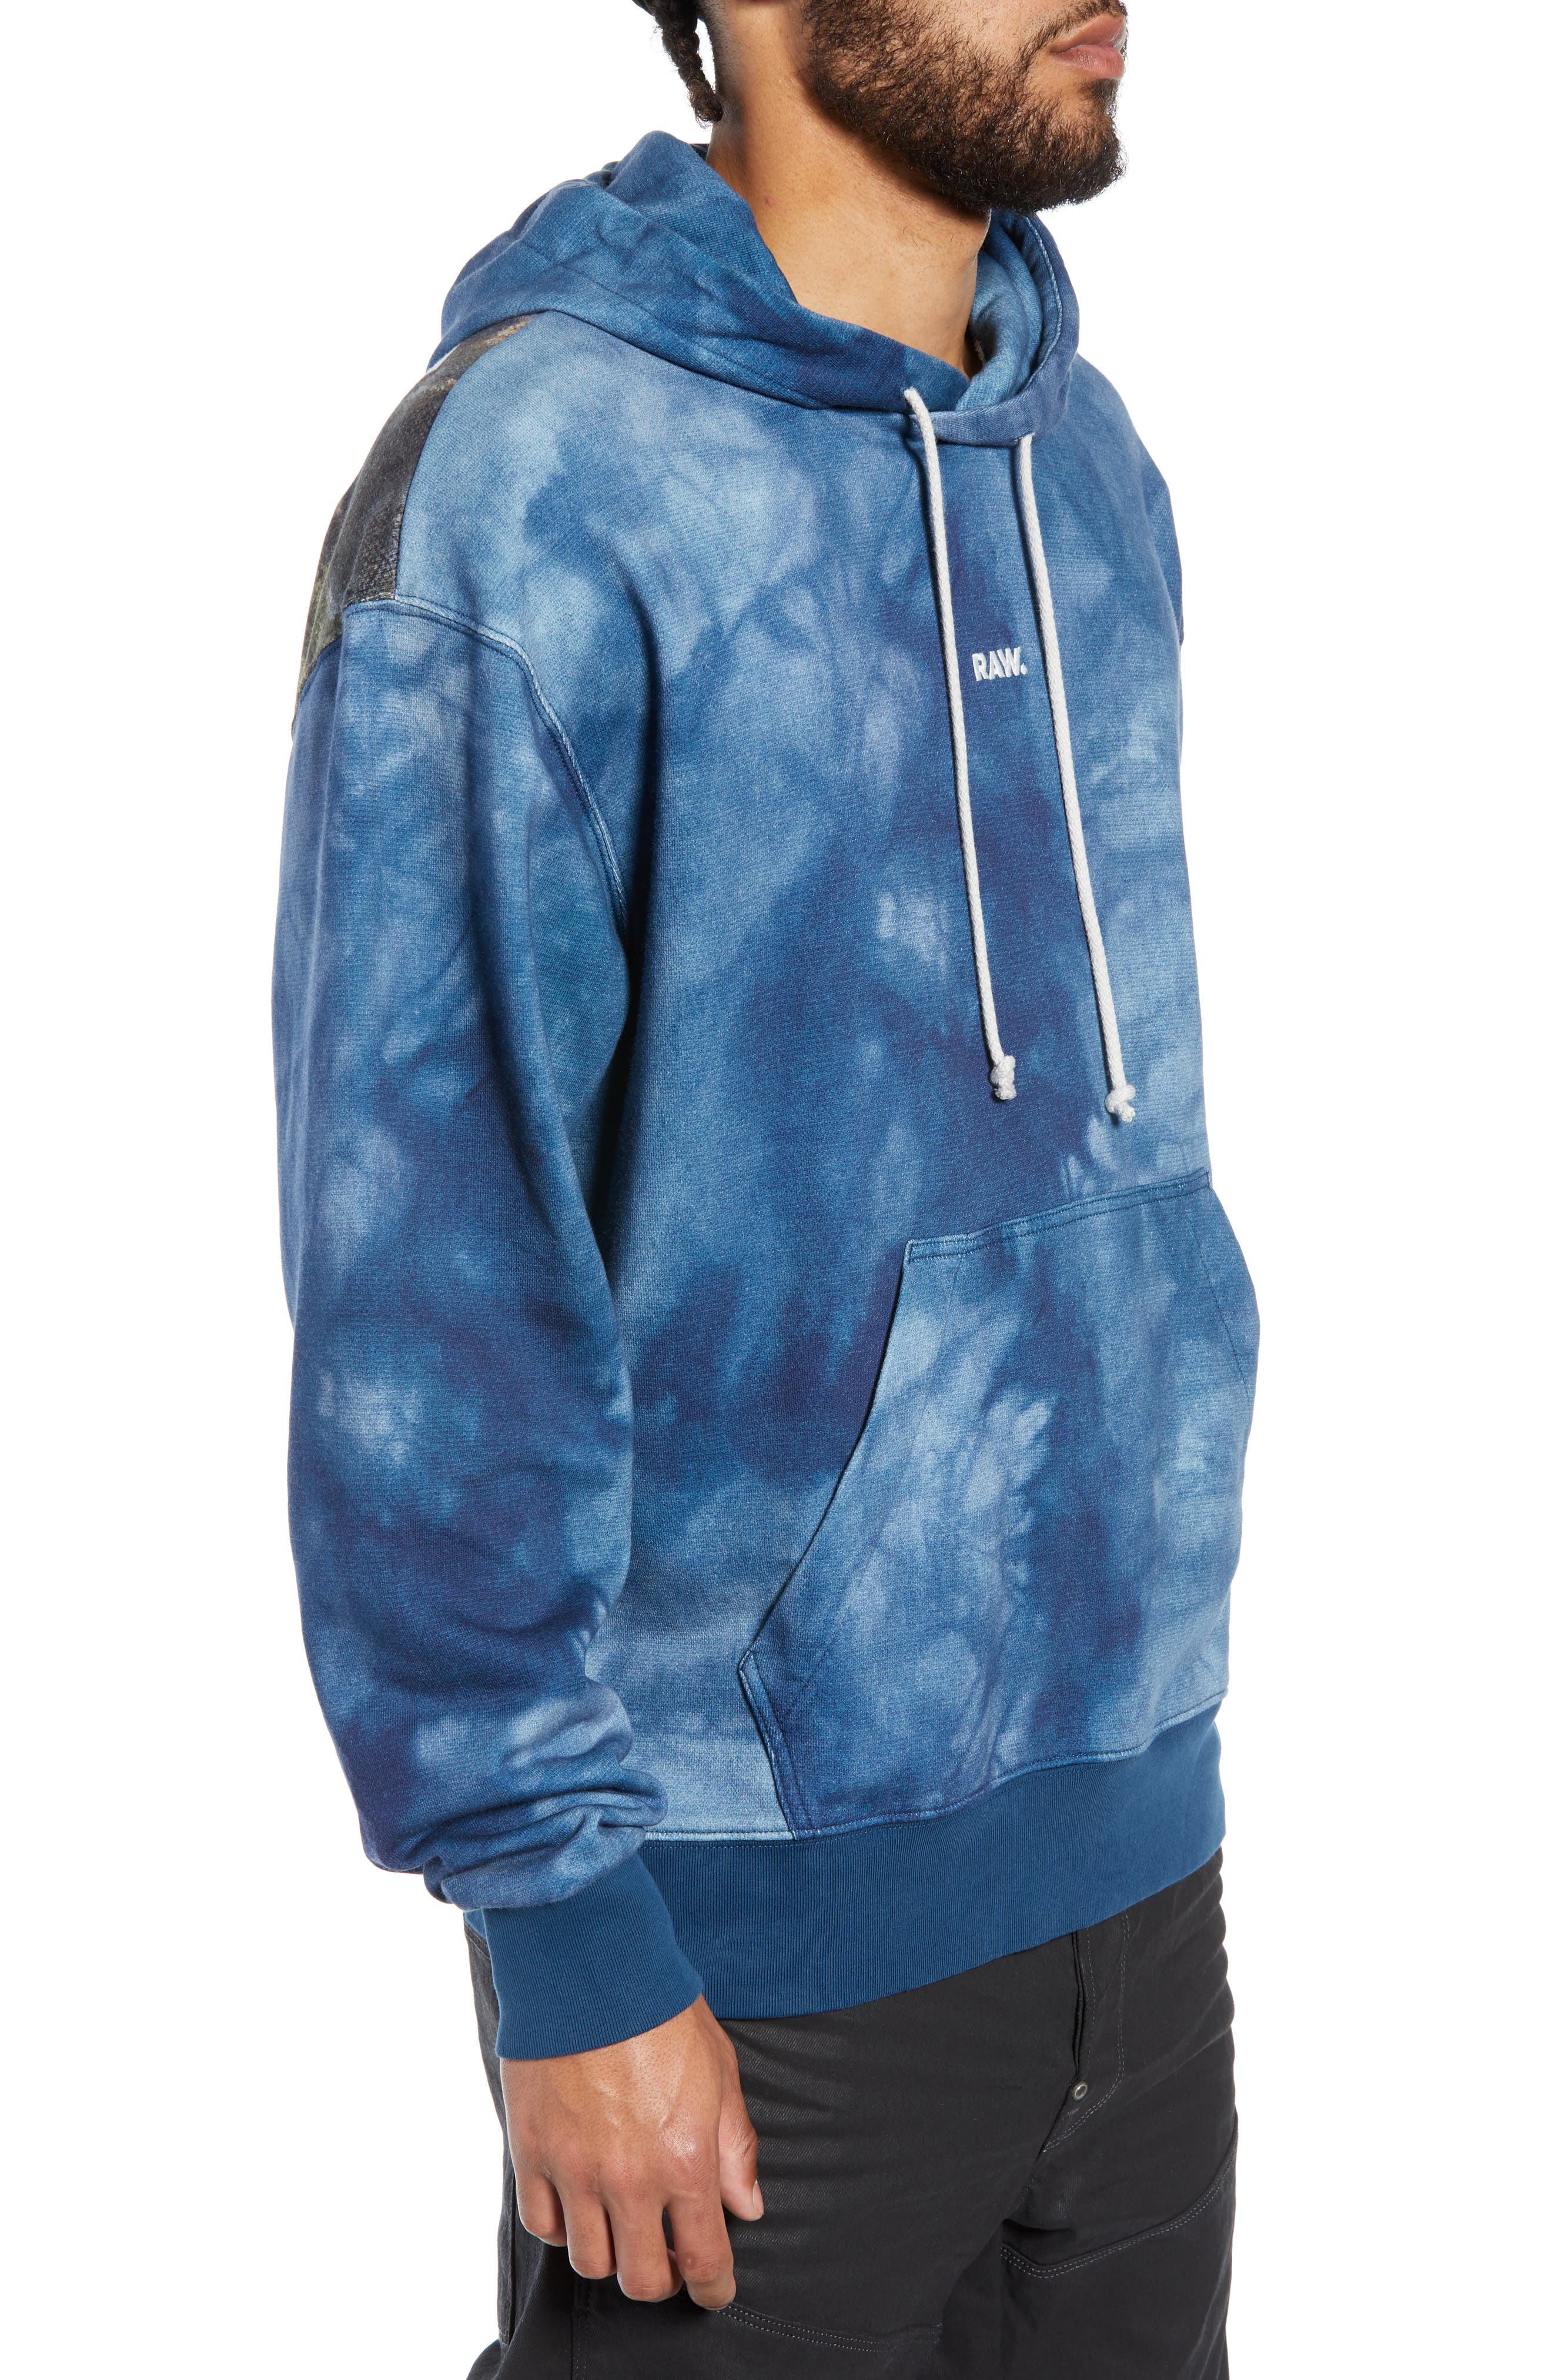 Cryrer Waterfall Hooded Sweatshirt,                             Alternate thumbnail 3, color,                             TEAL BLUE